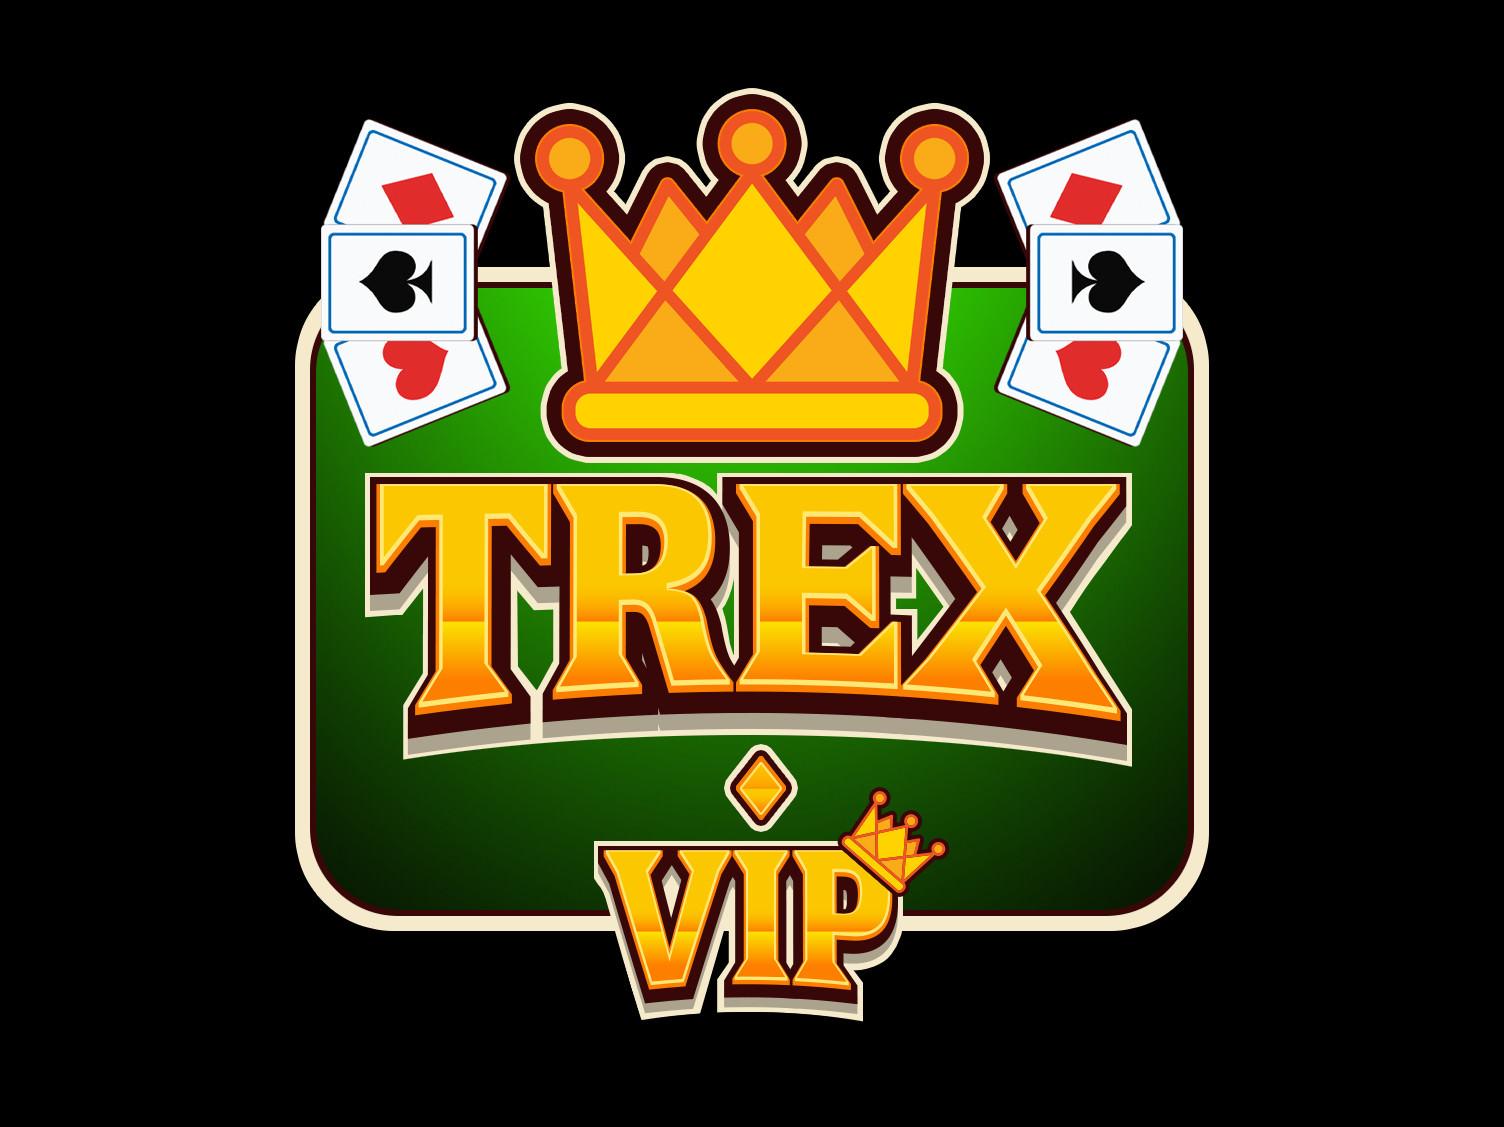 Trex VIP icon